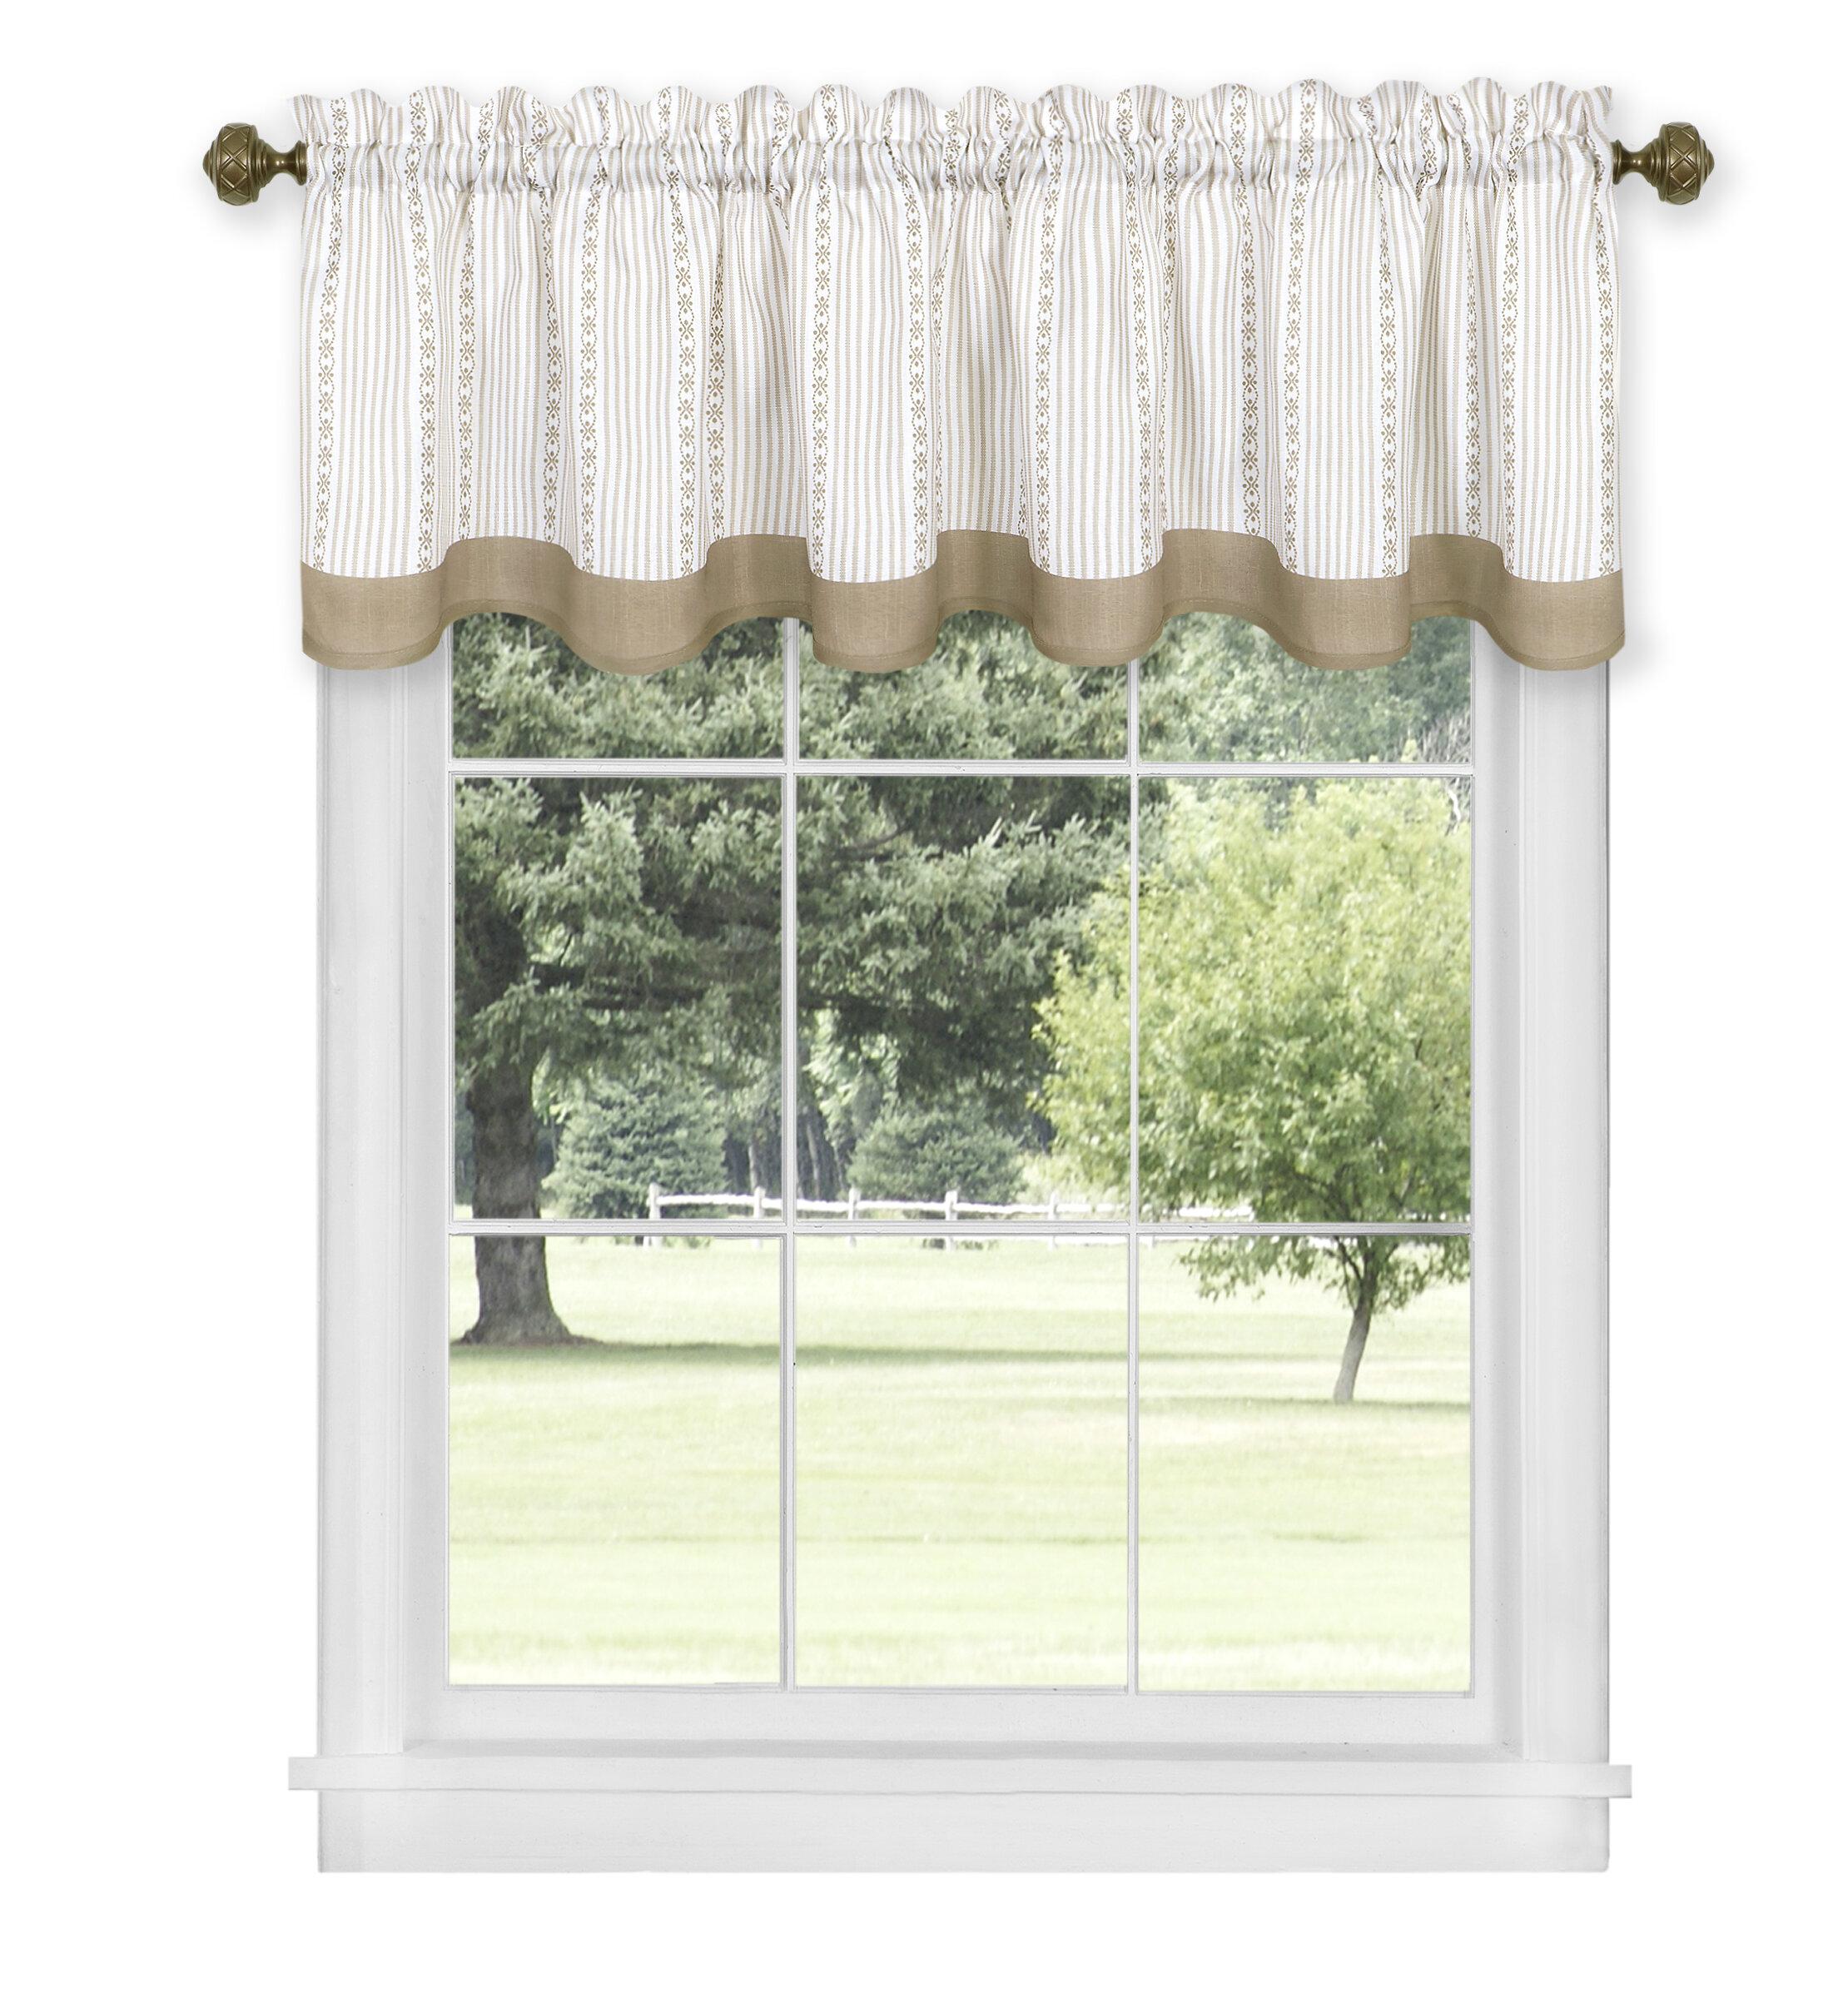 Charlton Home Lagoudera 58 Window Valance Reviews Wayfair